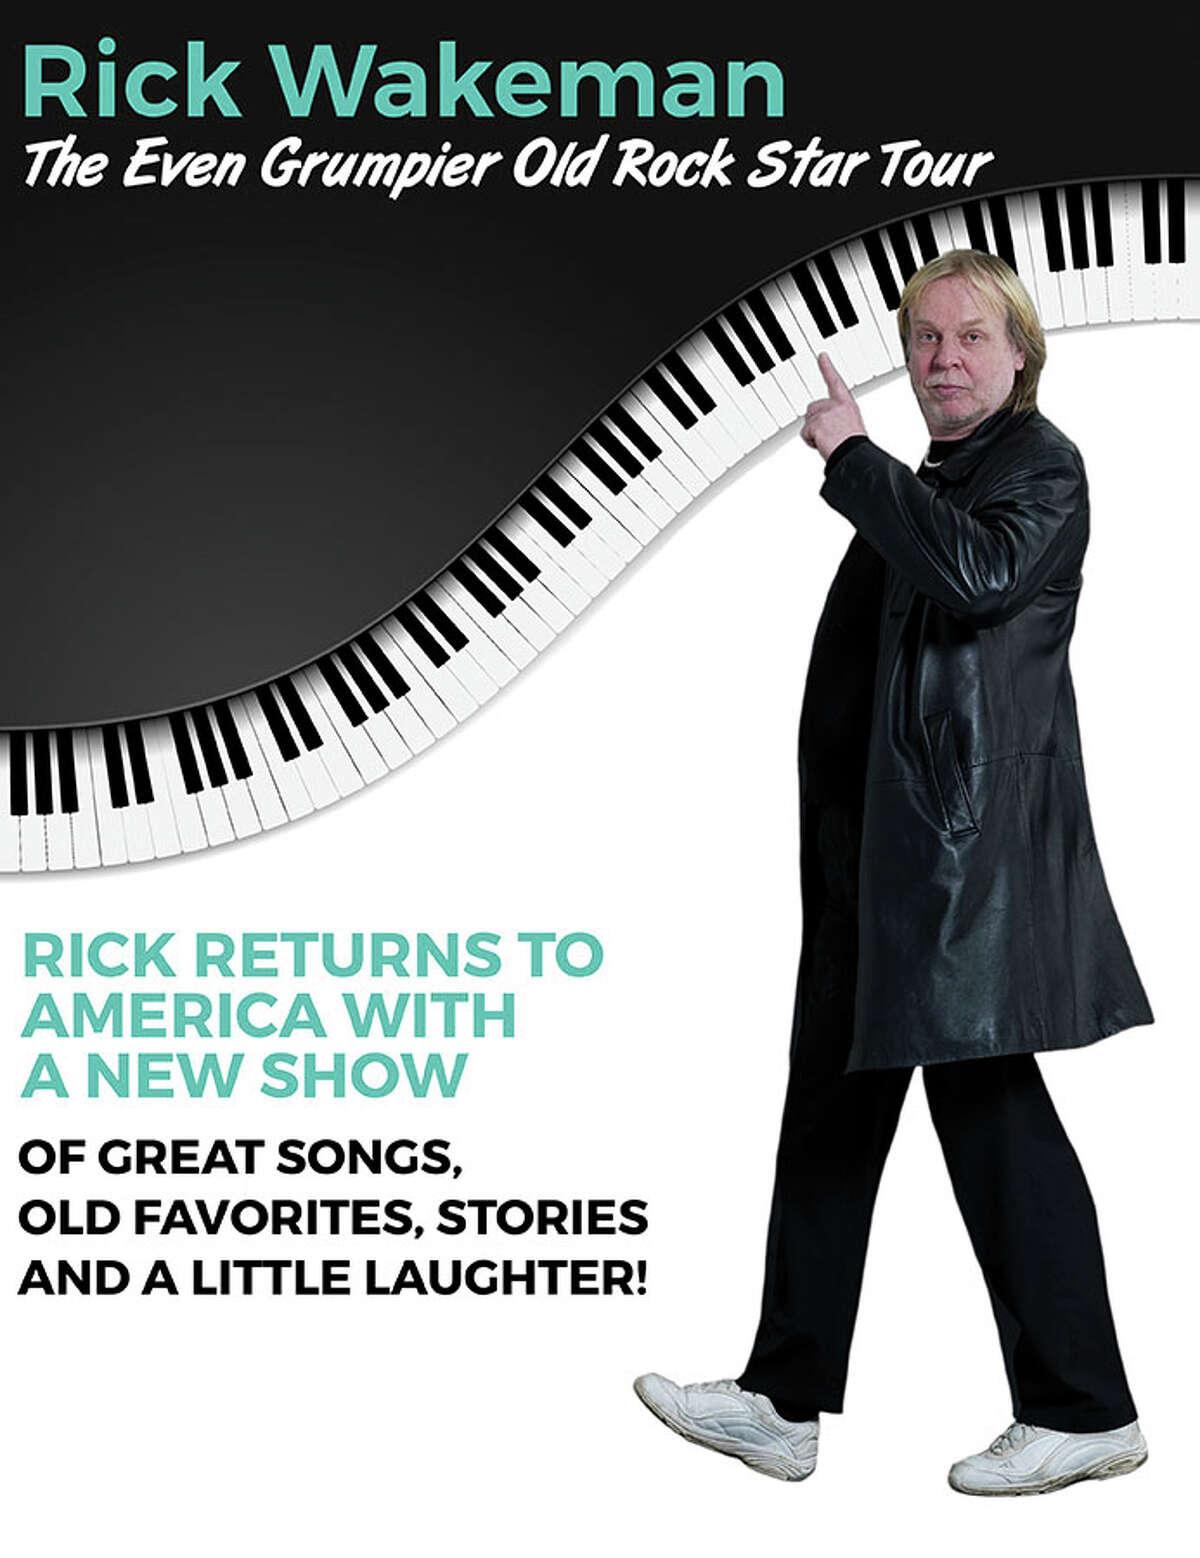 Rick Wakeman will perform at the Ridgefield Playhouse on Sat. Oct 30, 2021.